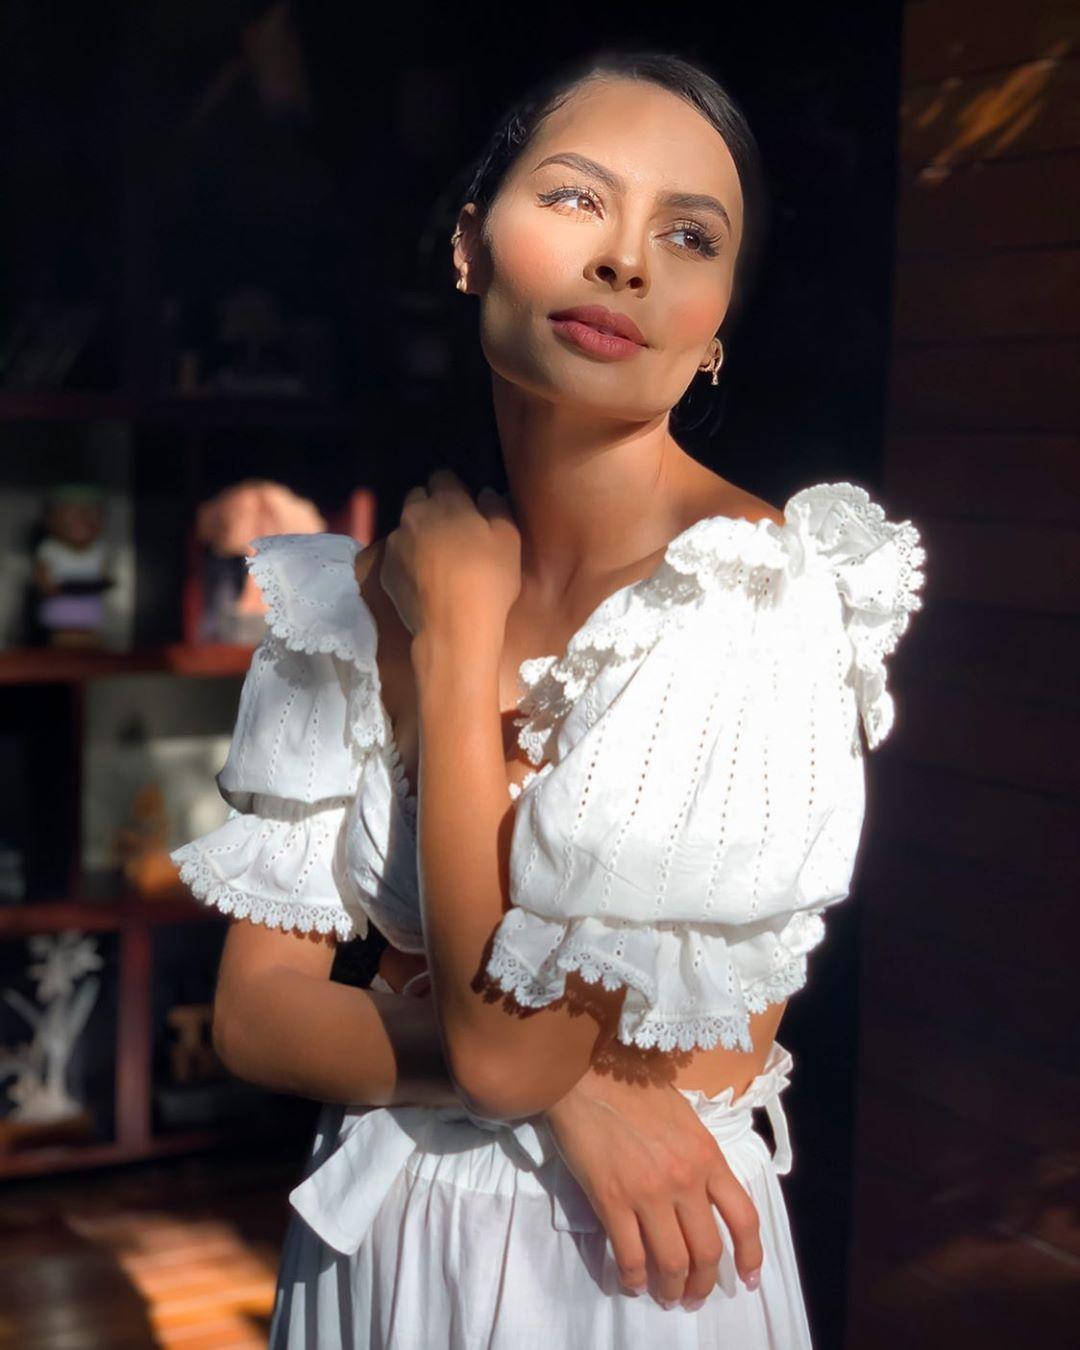 stephany pim, miss eco brasil 2017/top 3 de miss brasil universo 2017. - Página 10 10612710